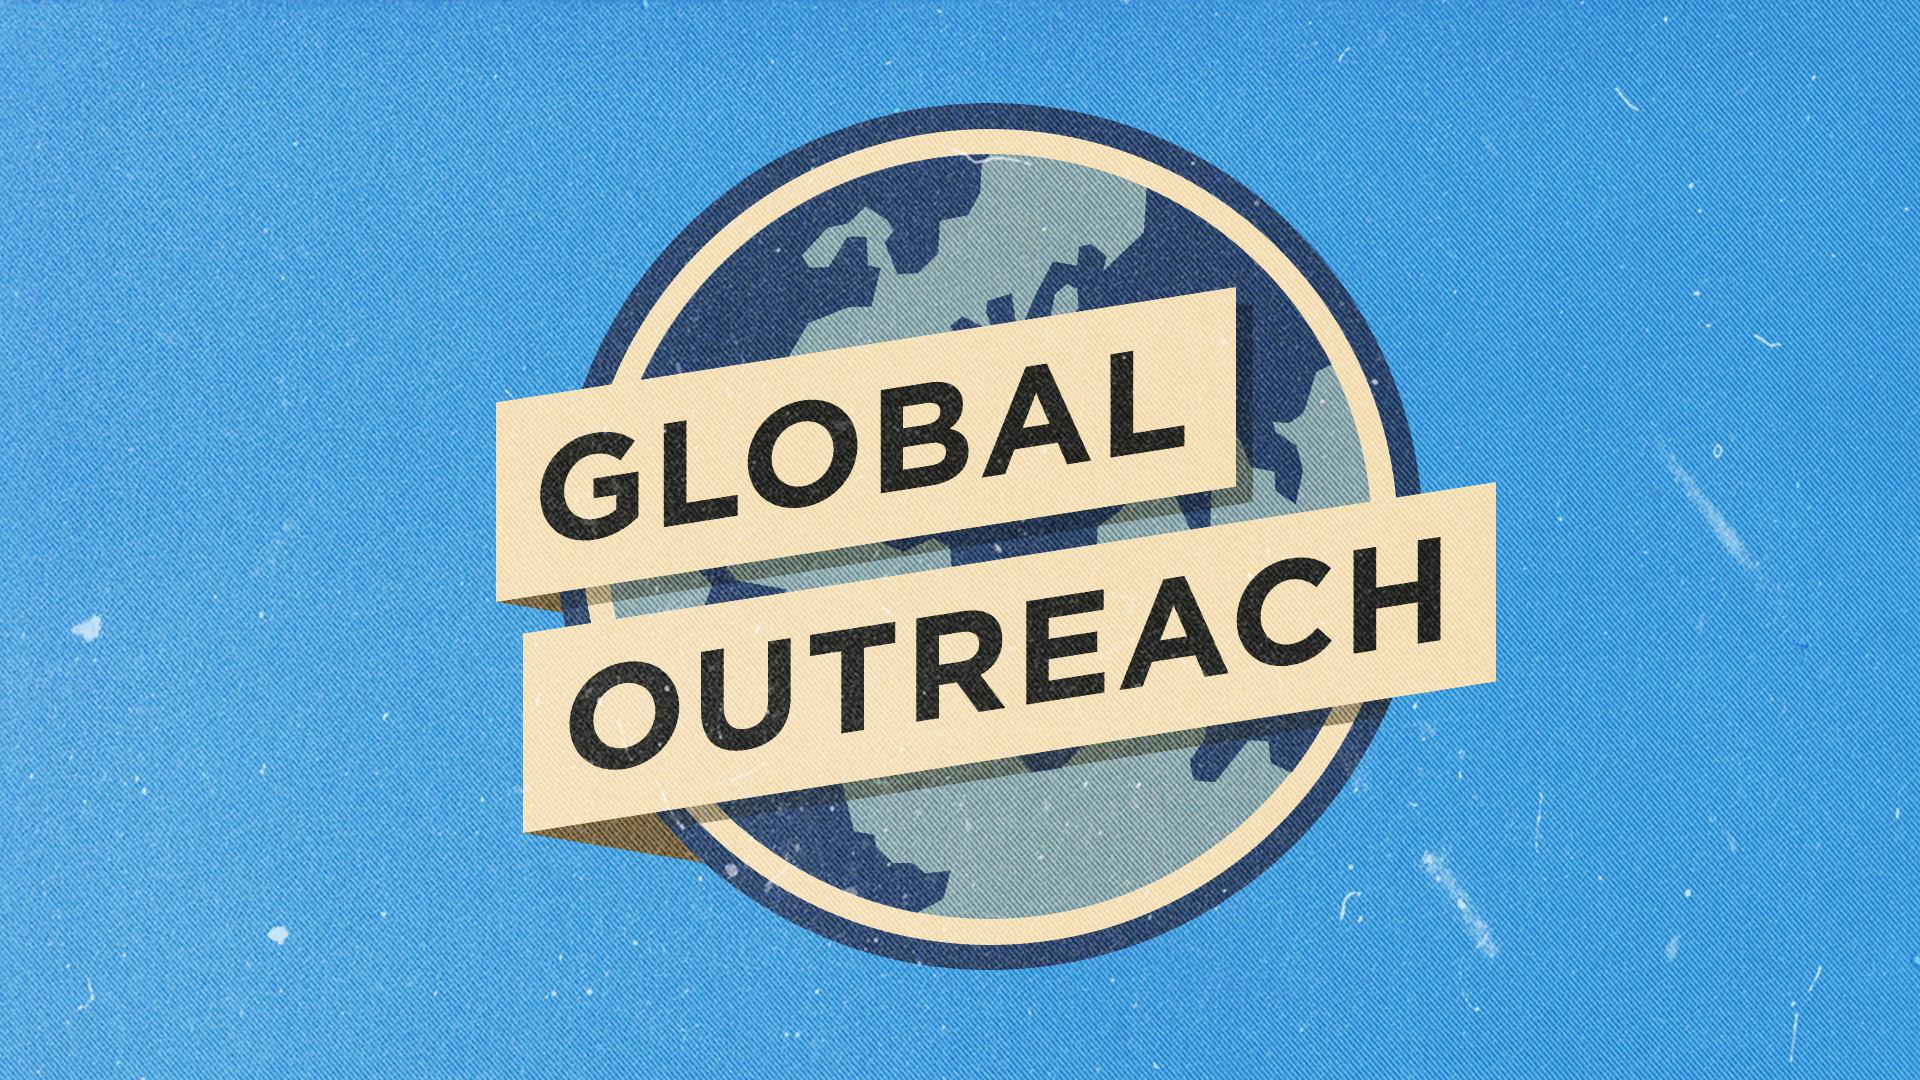 GLOBAL OUTREACH PLEDGE